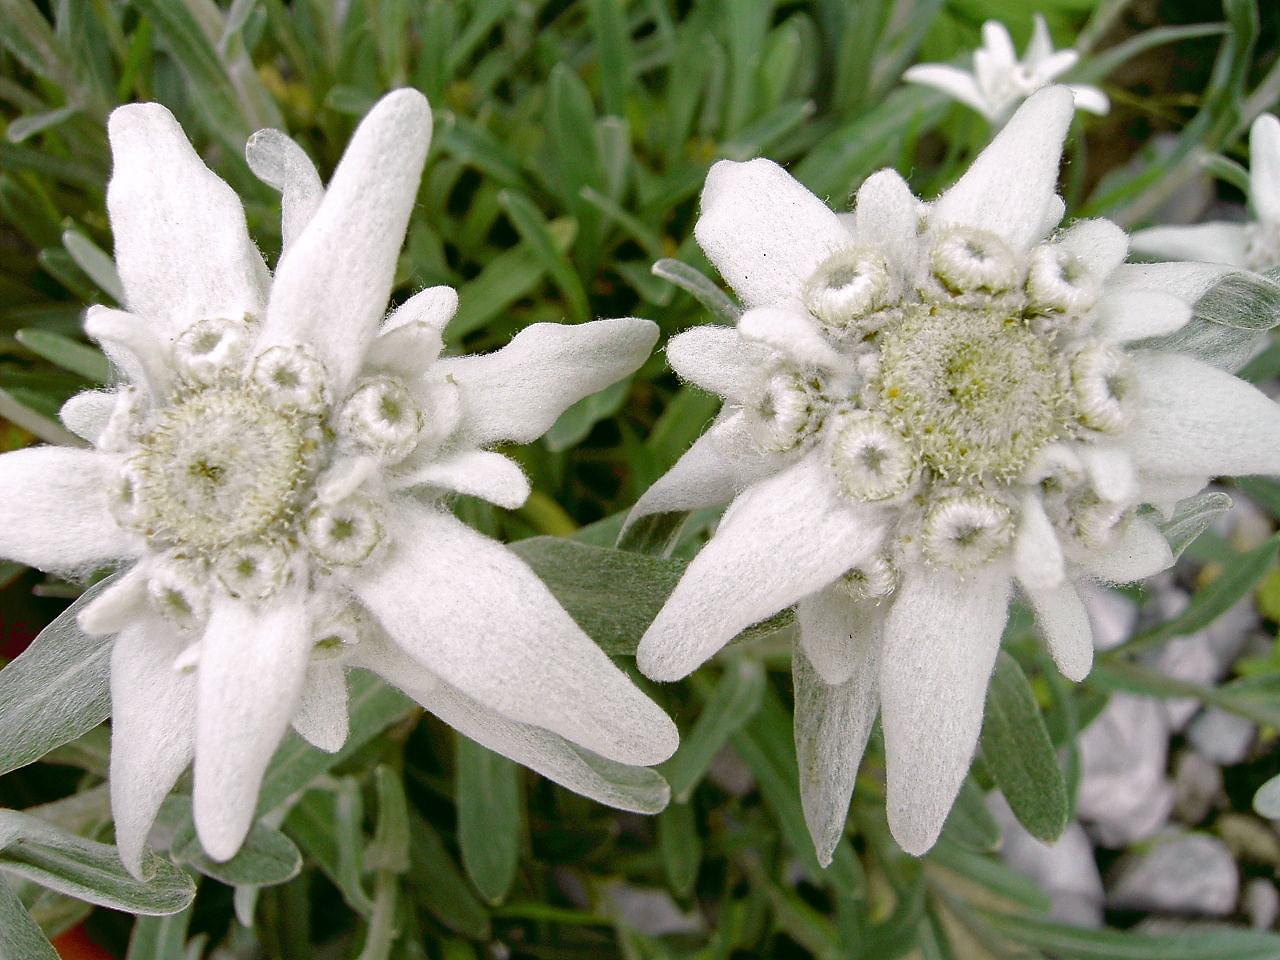 Mengenal Edelweis Bunga Abadi Pojokgaul Com